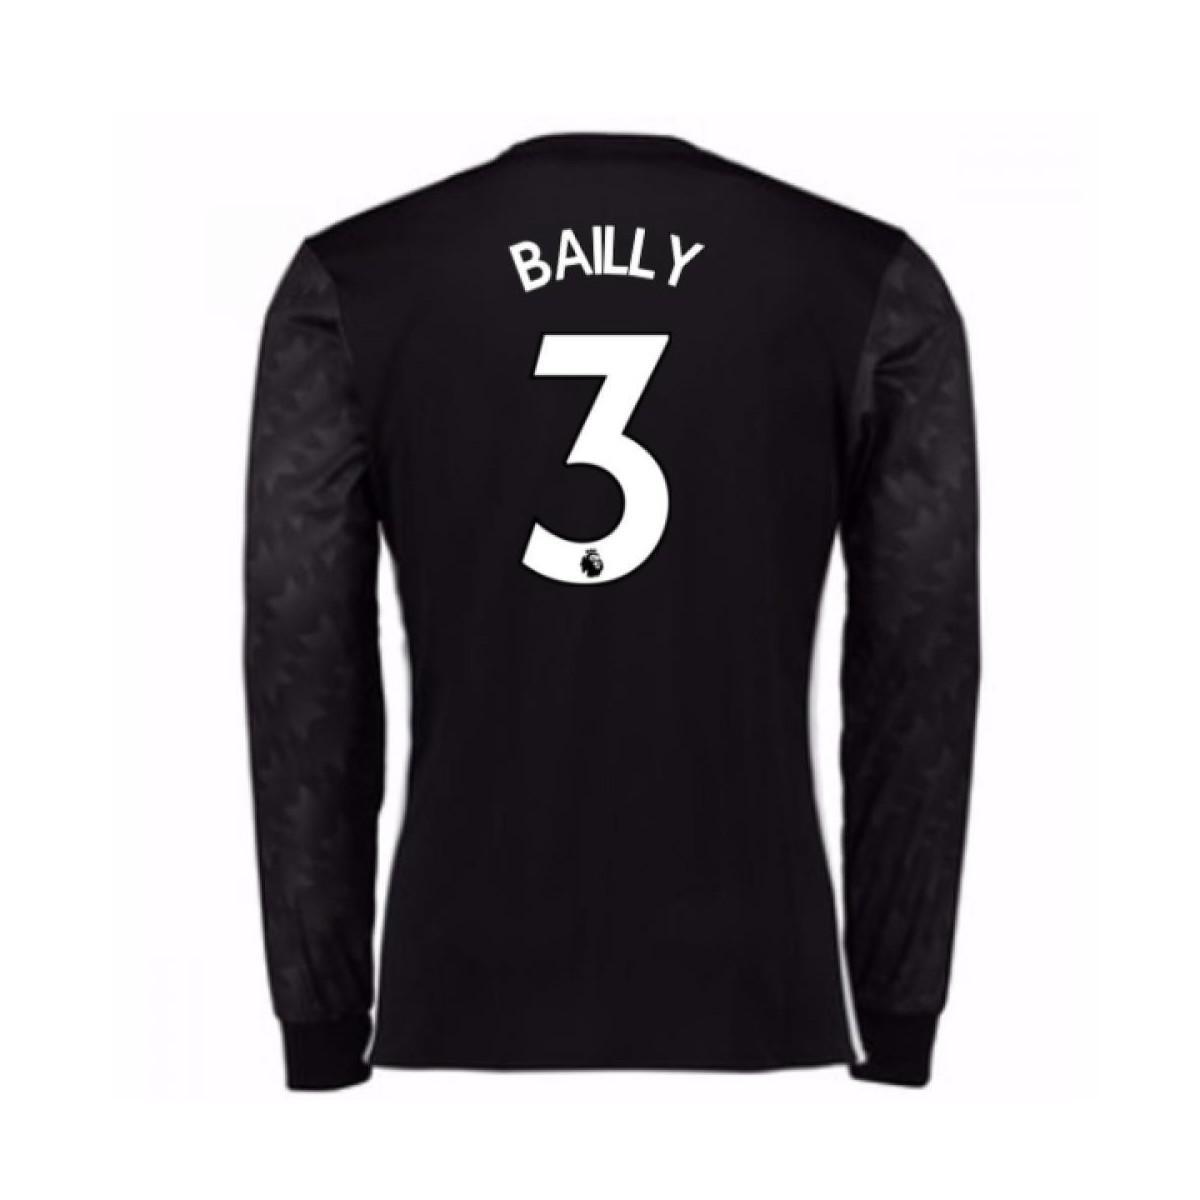 93e0fca06 Adidas - 2017-18 Man Utd Away Long Sleeve (bailly 3) Men s In. View  fullscreen